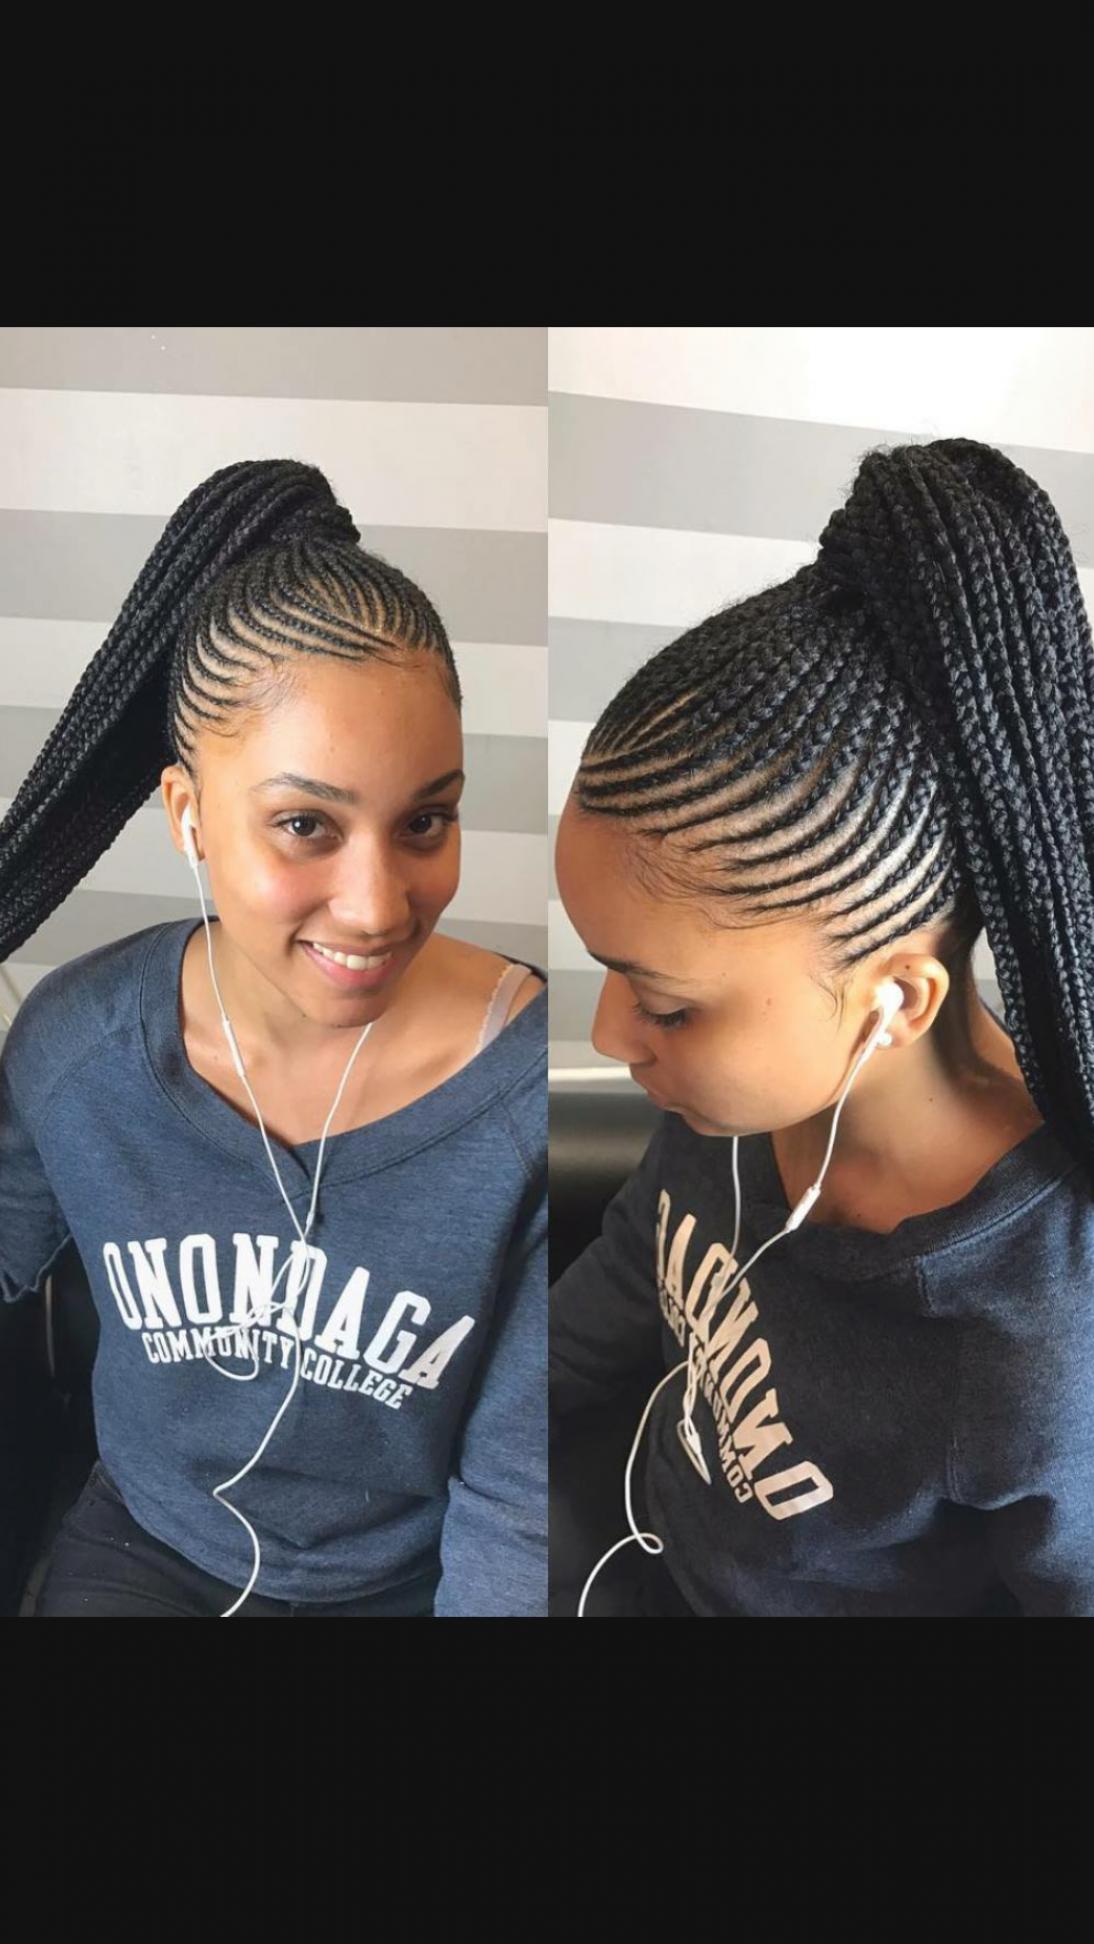 Scalp Braids Ponytail Hair Styles Cornrow Hairstyles Braided Ponytail Hairstyles